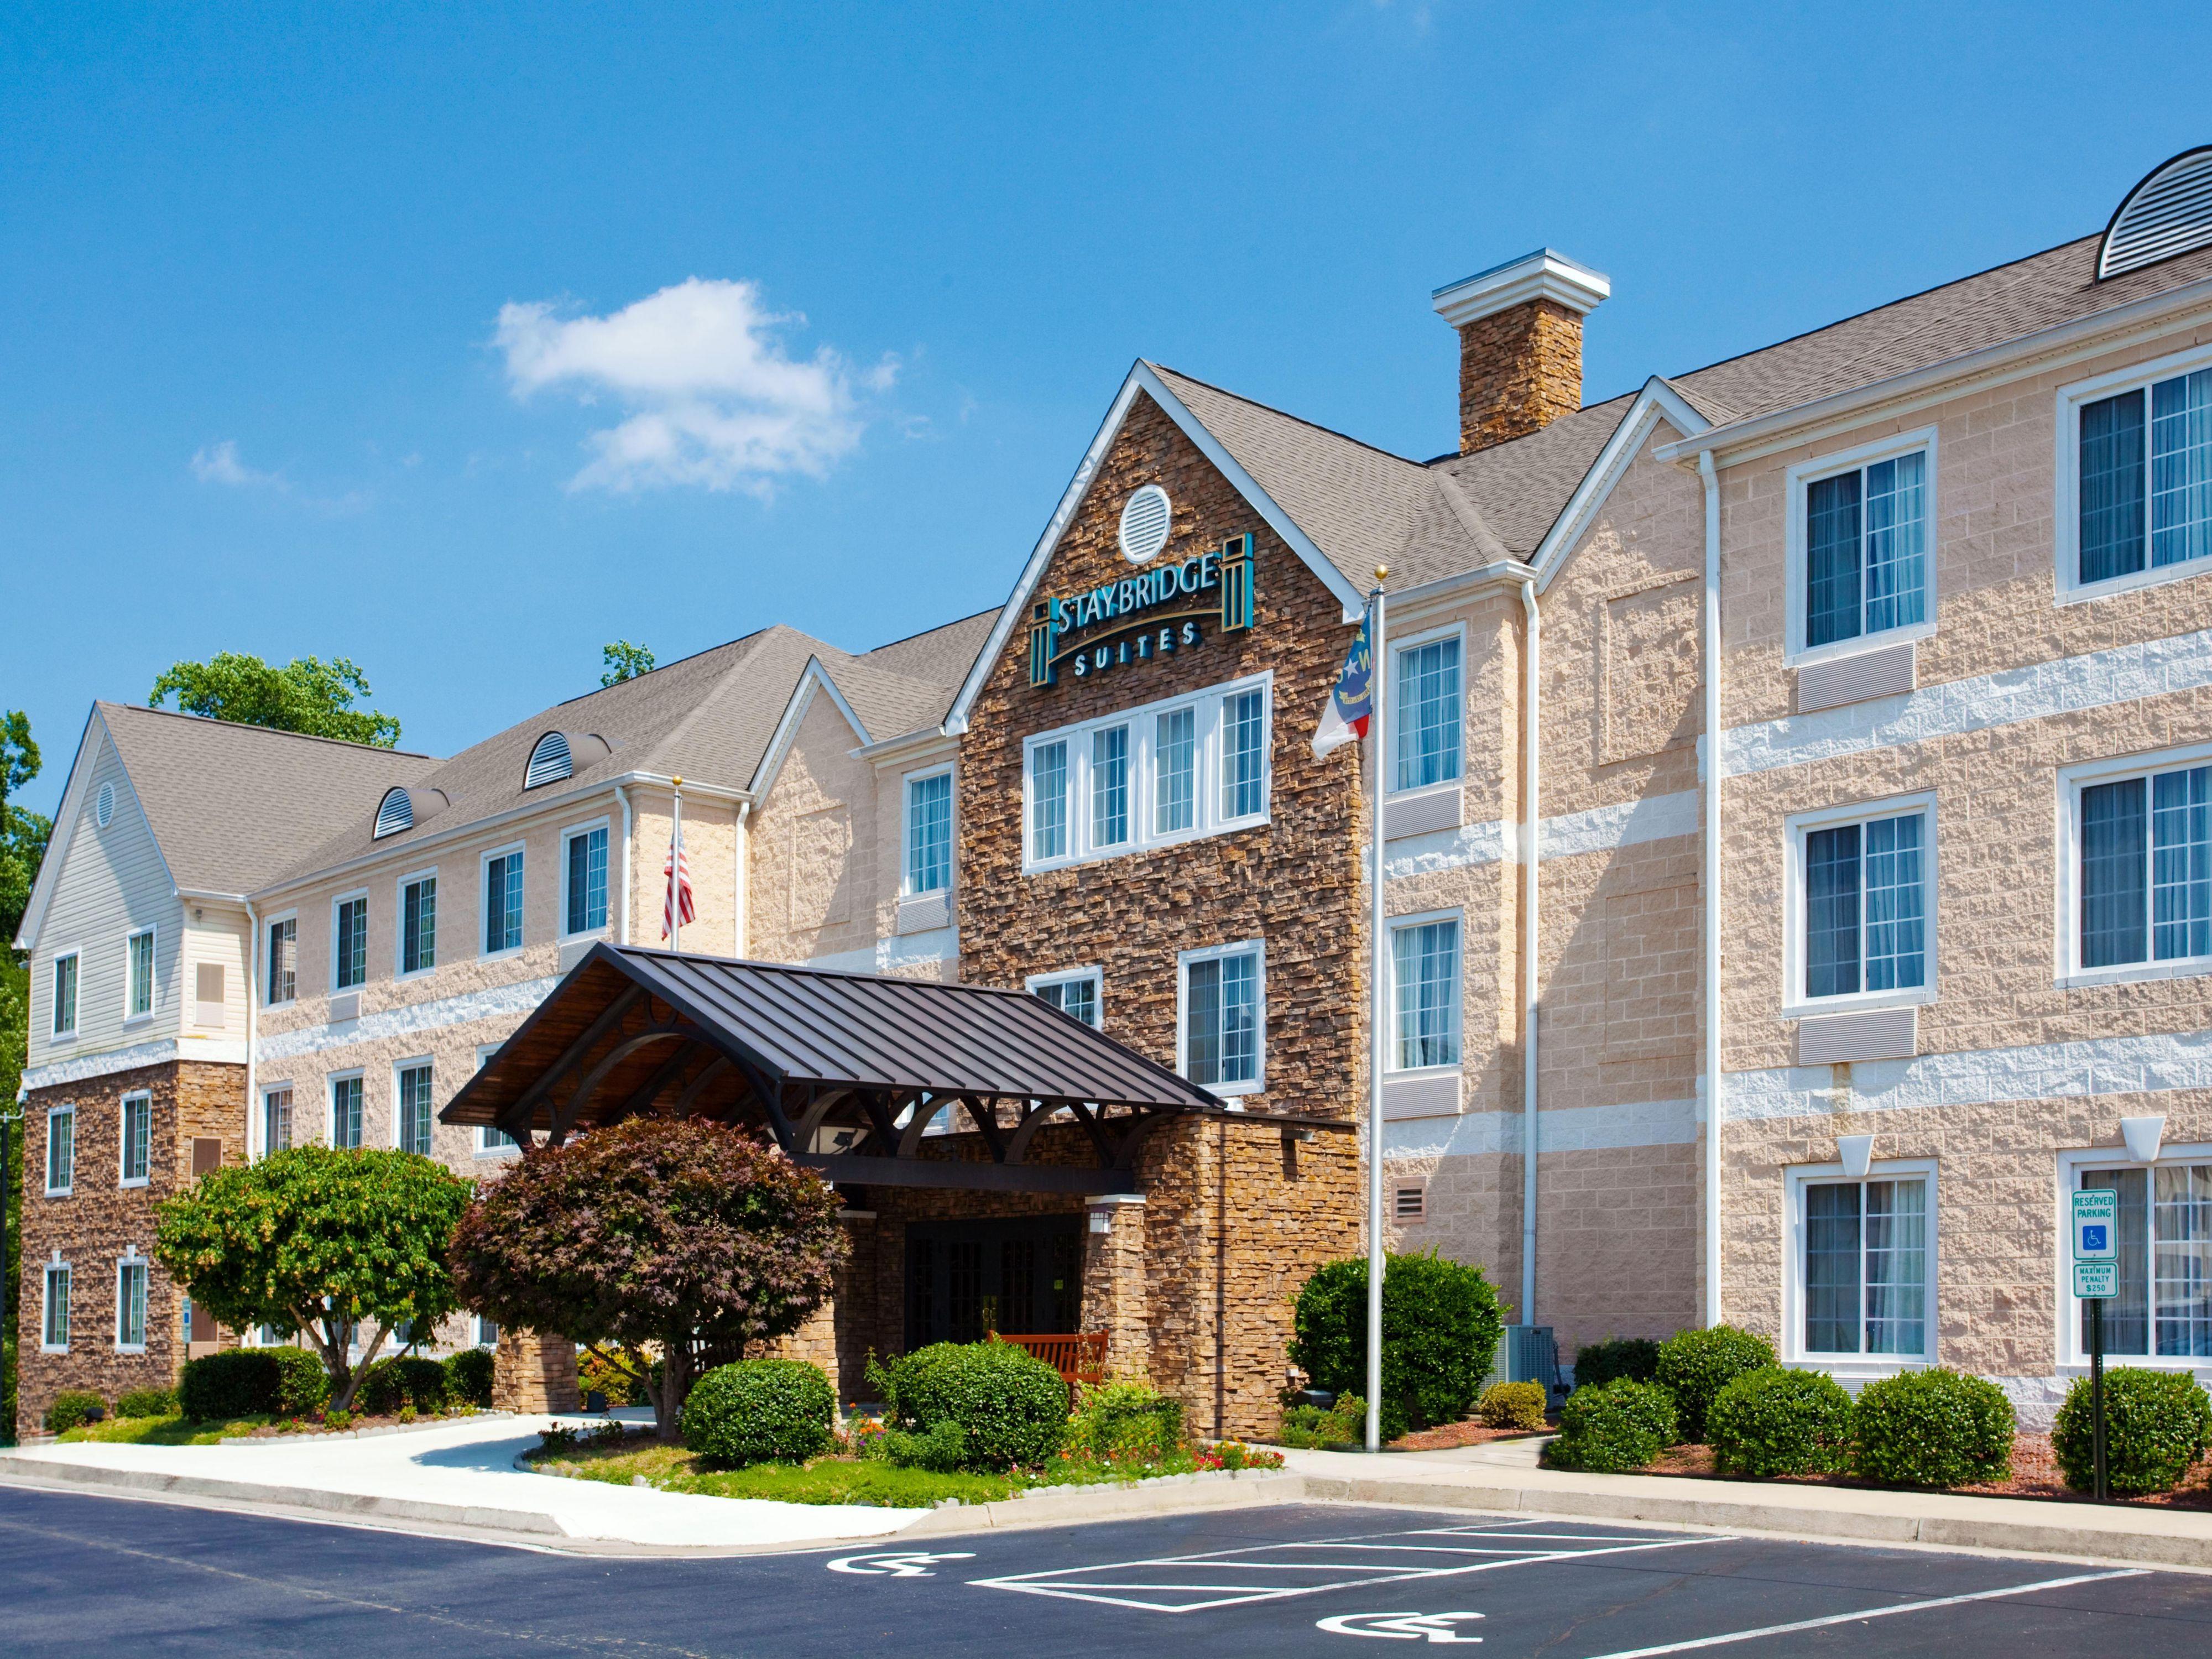 Morrisville Hotels Staybridge Suites Raleigh Durham Apt Extended Stay Hotel In North Carolina